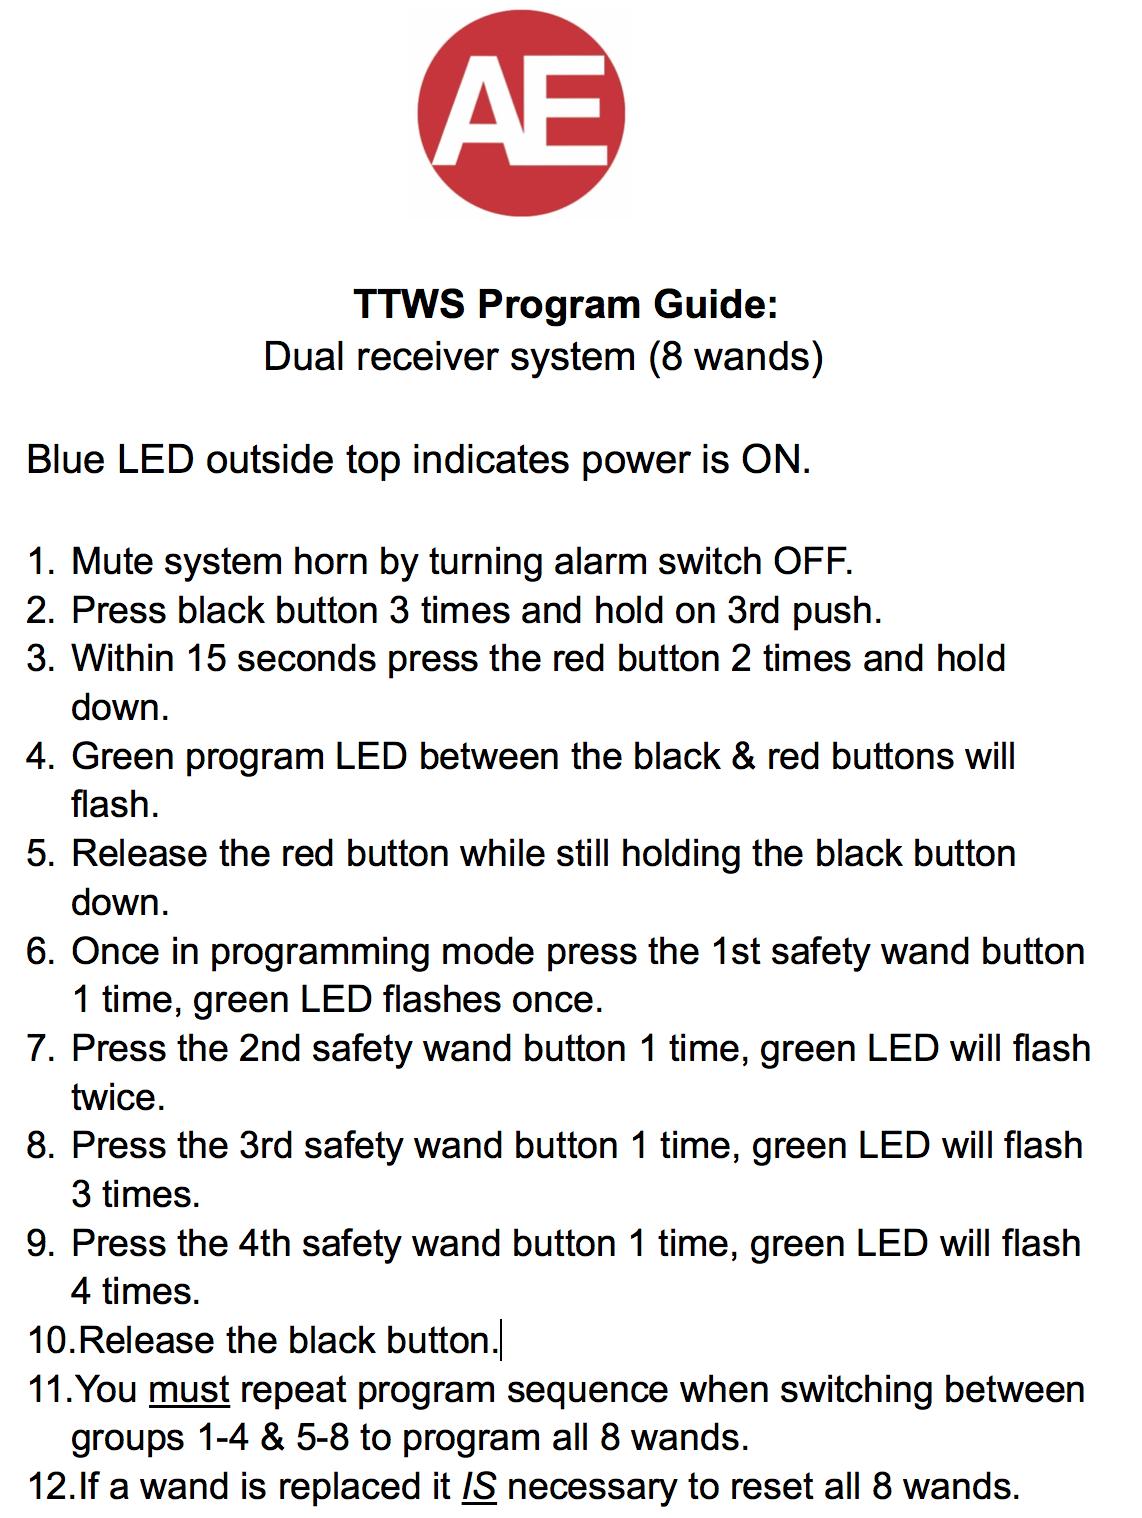 TTWS_Program_Guide_Dualb.png